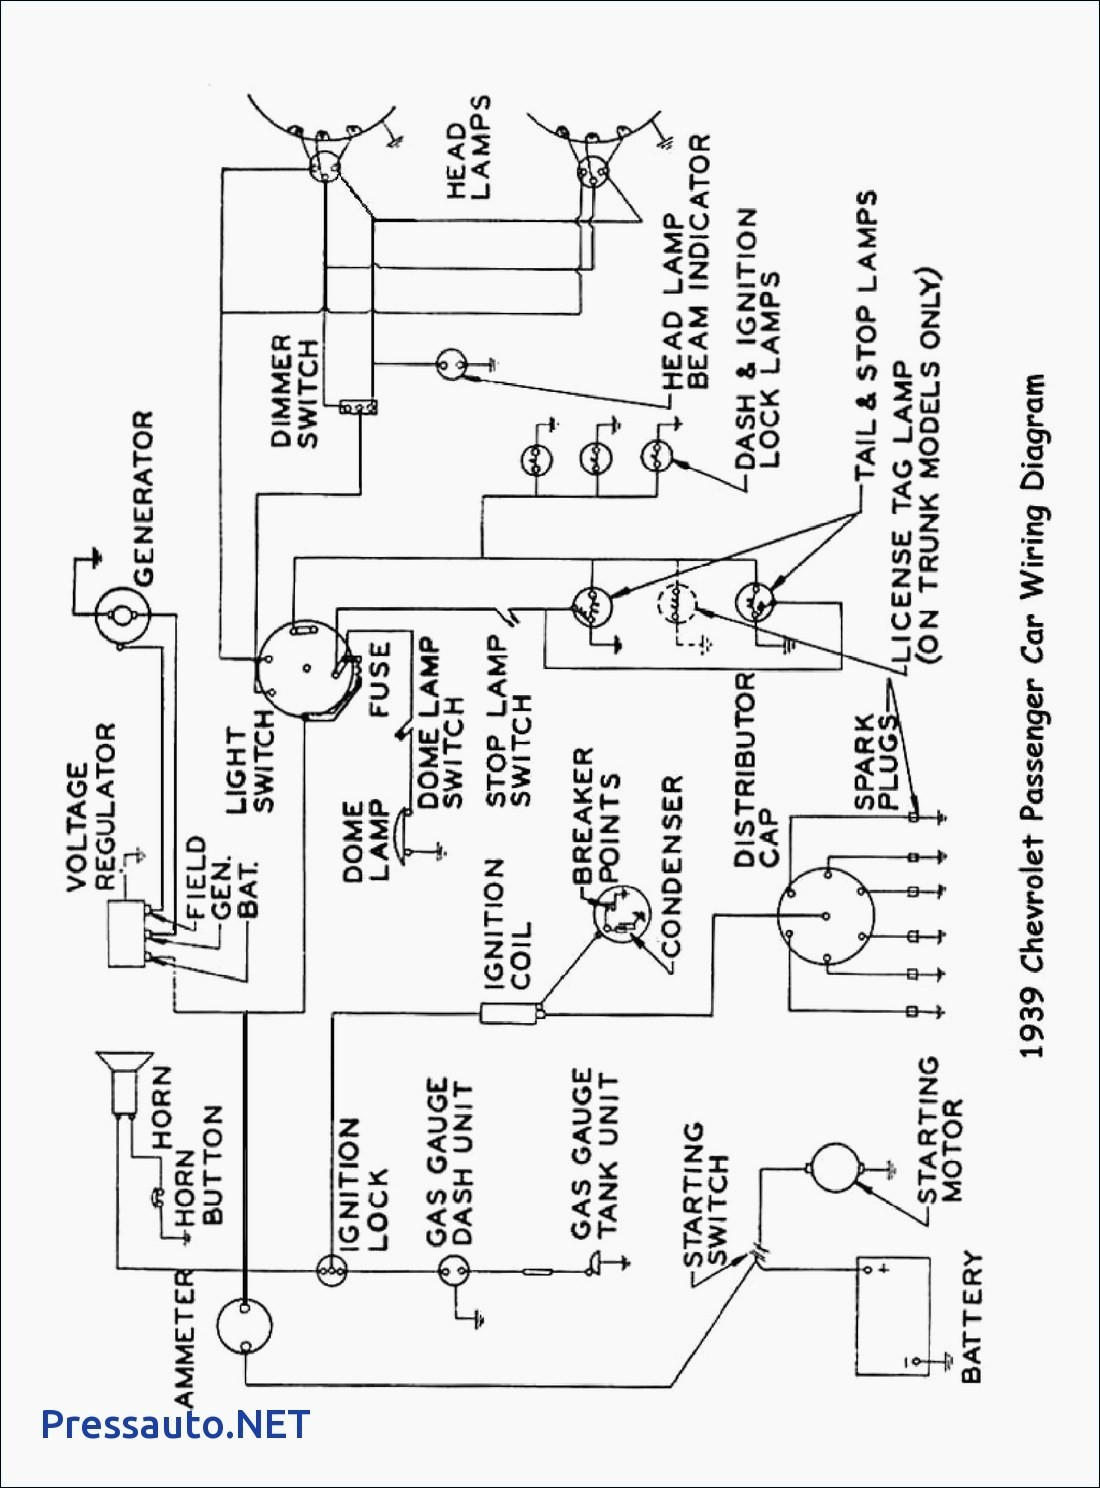 John Deere 4430 Fuse Box   Wiring Diagram on